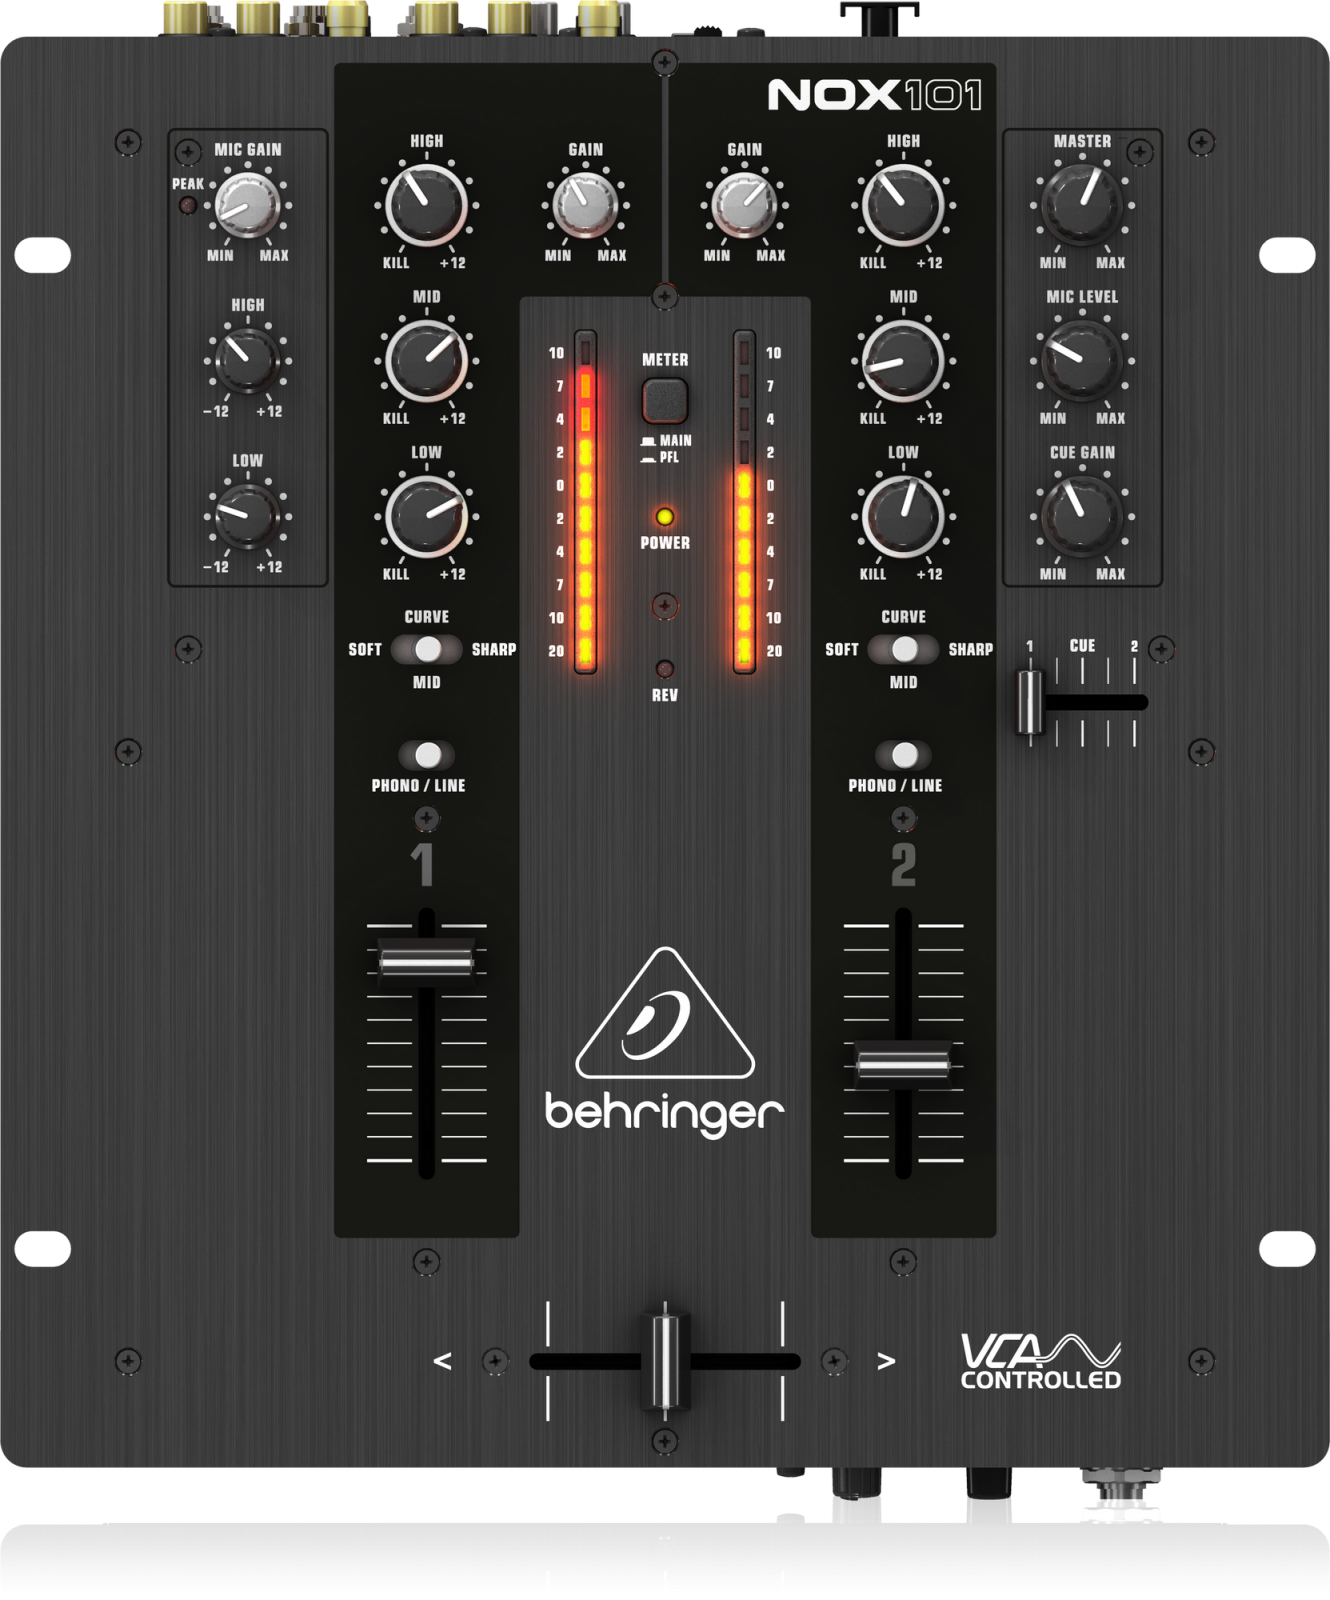 BEHRINGER NOX101 PREMIUM 2-CHANNEL DJ MIXER W/FULL VCA-CONTROL  ULTRAGLIDE CROSSFADER